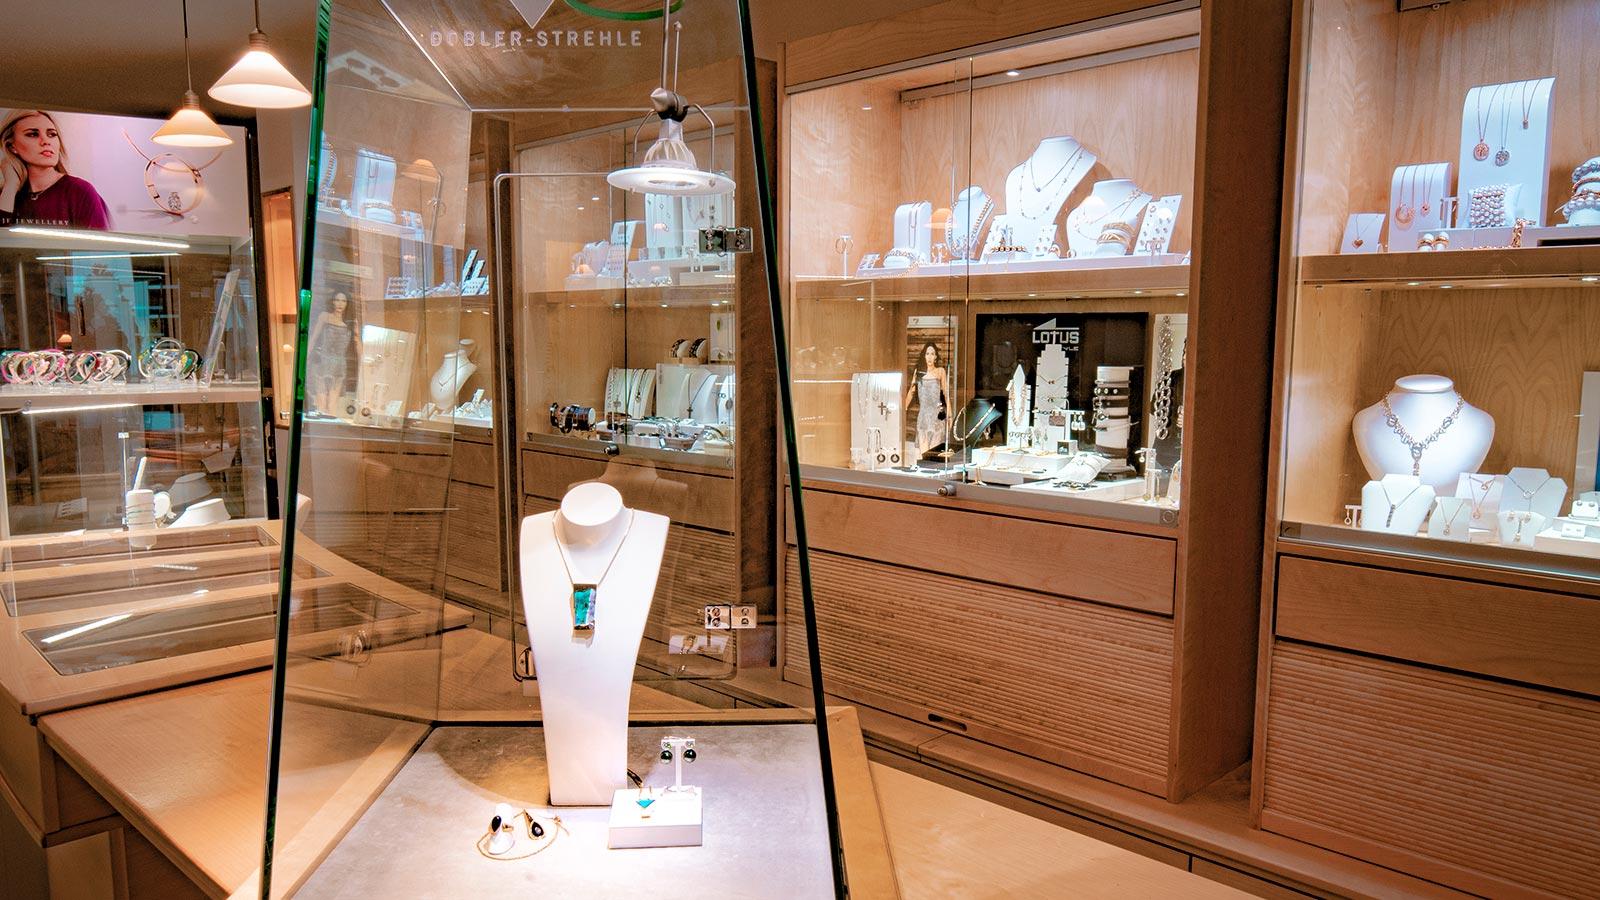 Dobler Strehle Geschäft Juwelier